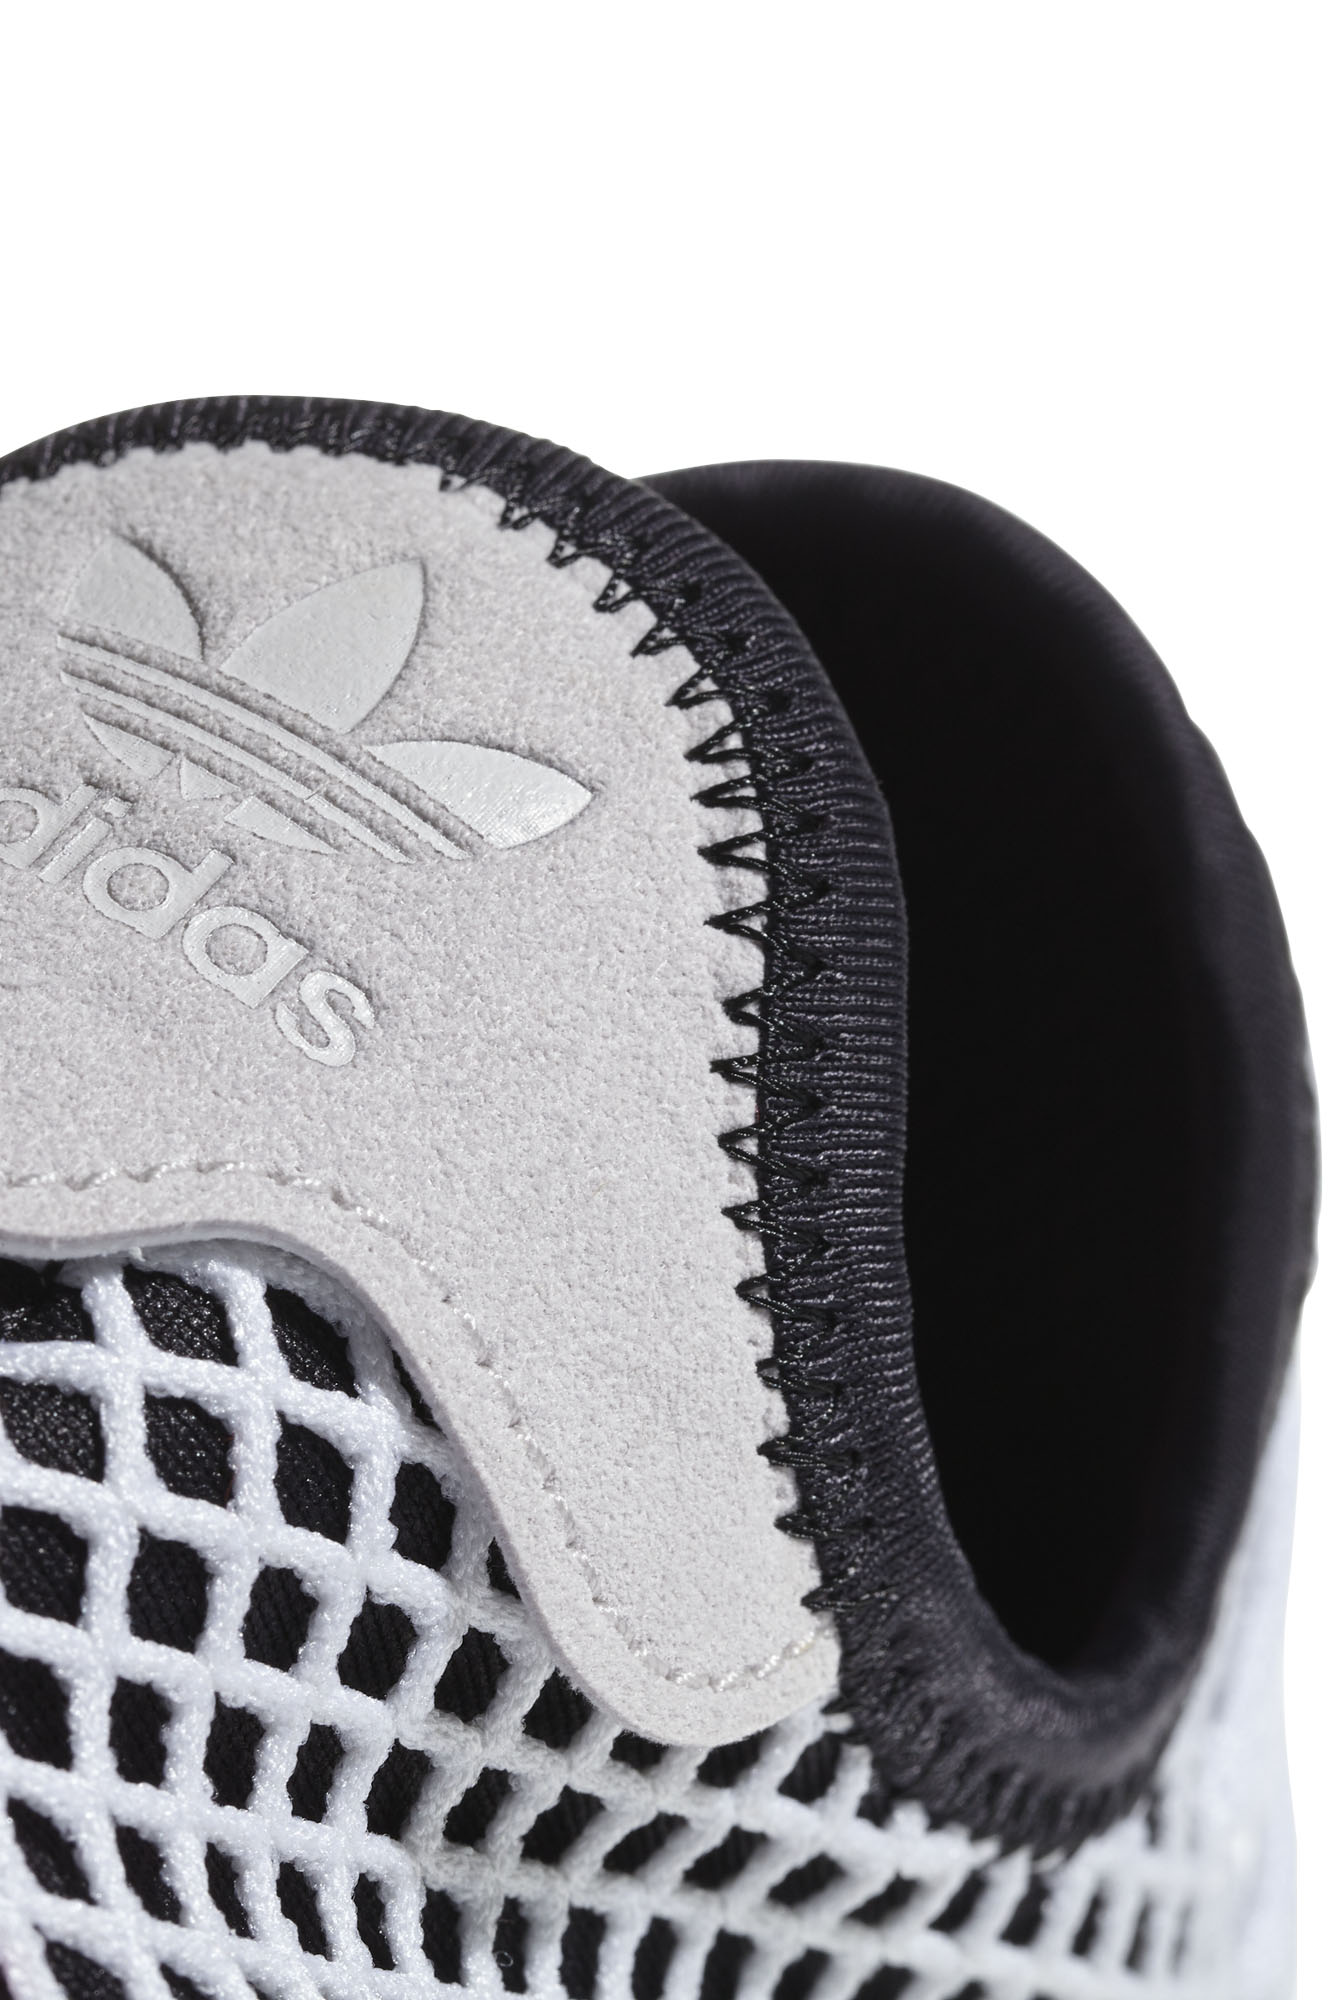 3a65afd66 Cq2909 Deerupt Dzień Na Runner Originals Adidas Co Buty Pg4nqAZvBW